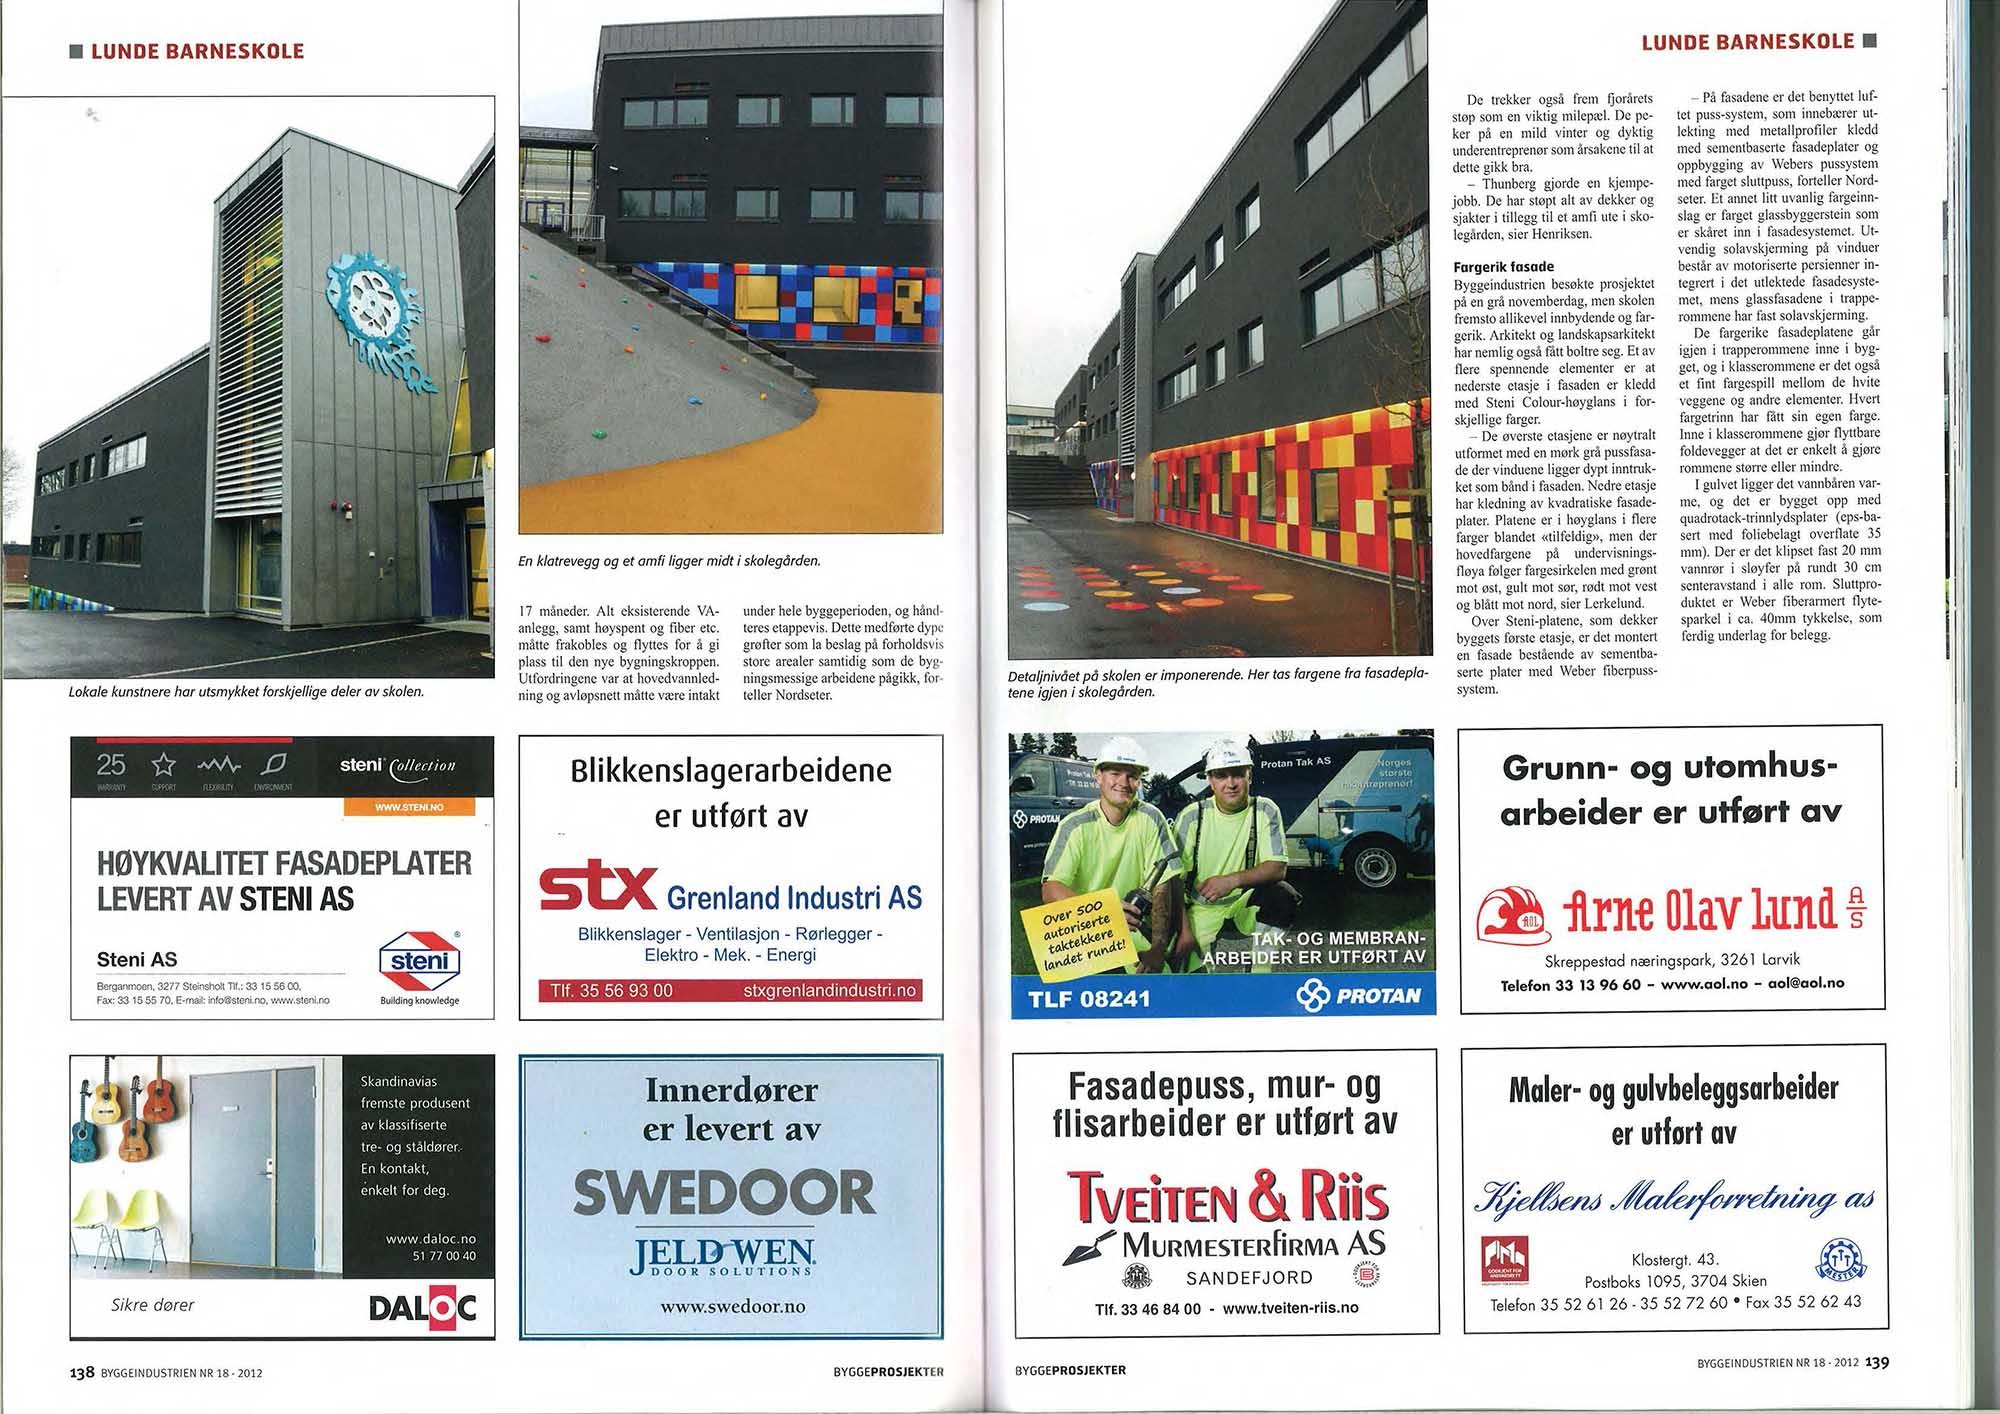 Lunde-byggeindustrien3.jpg